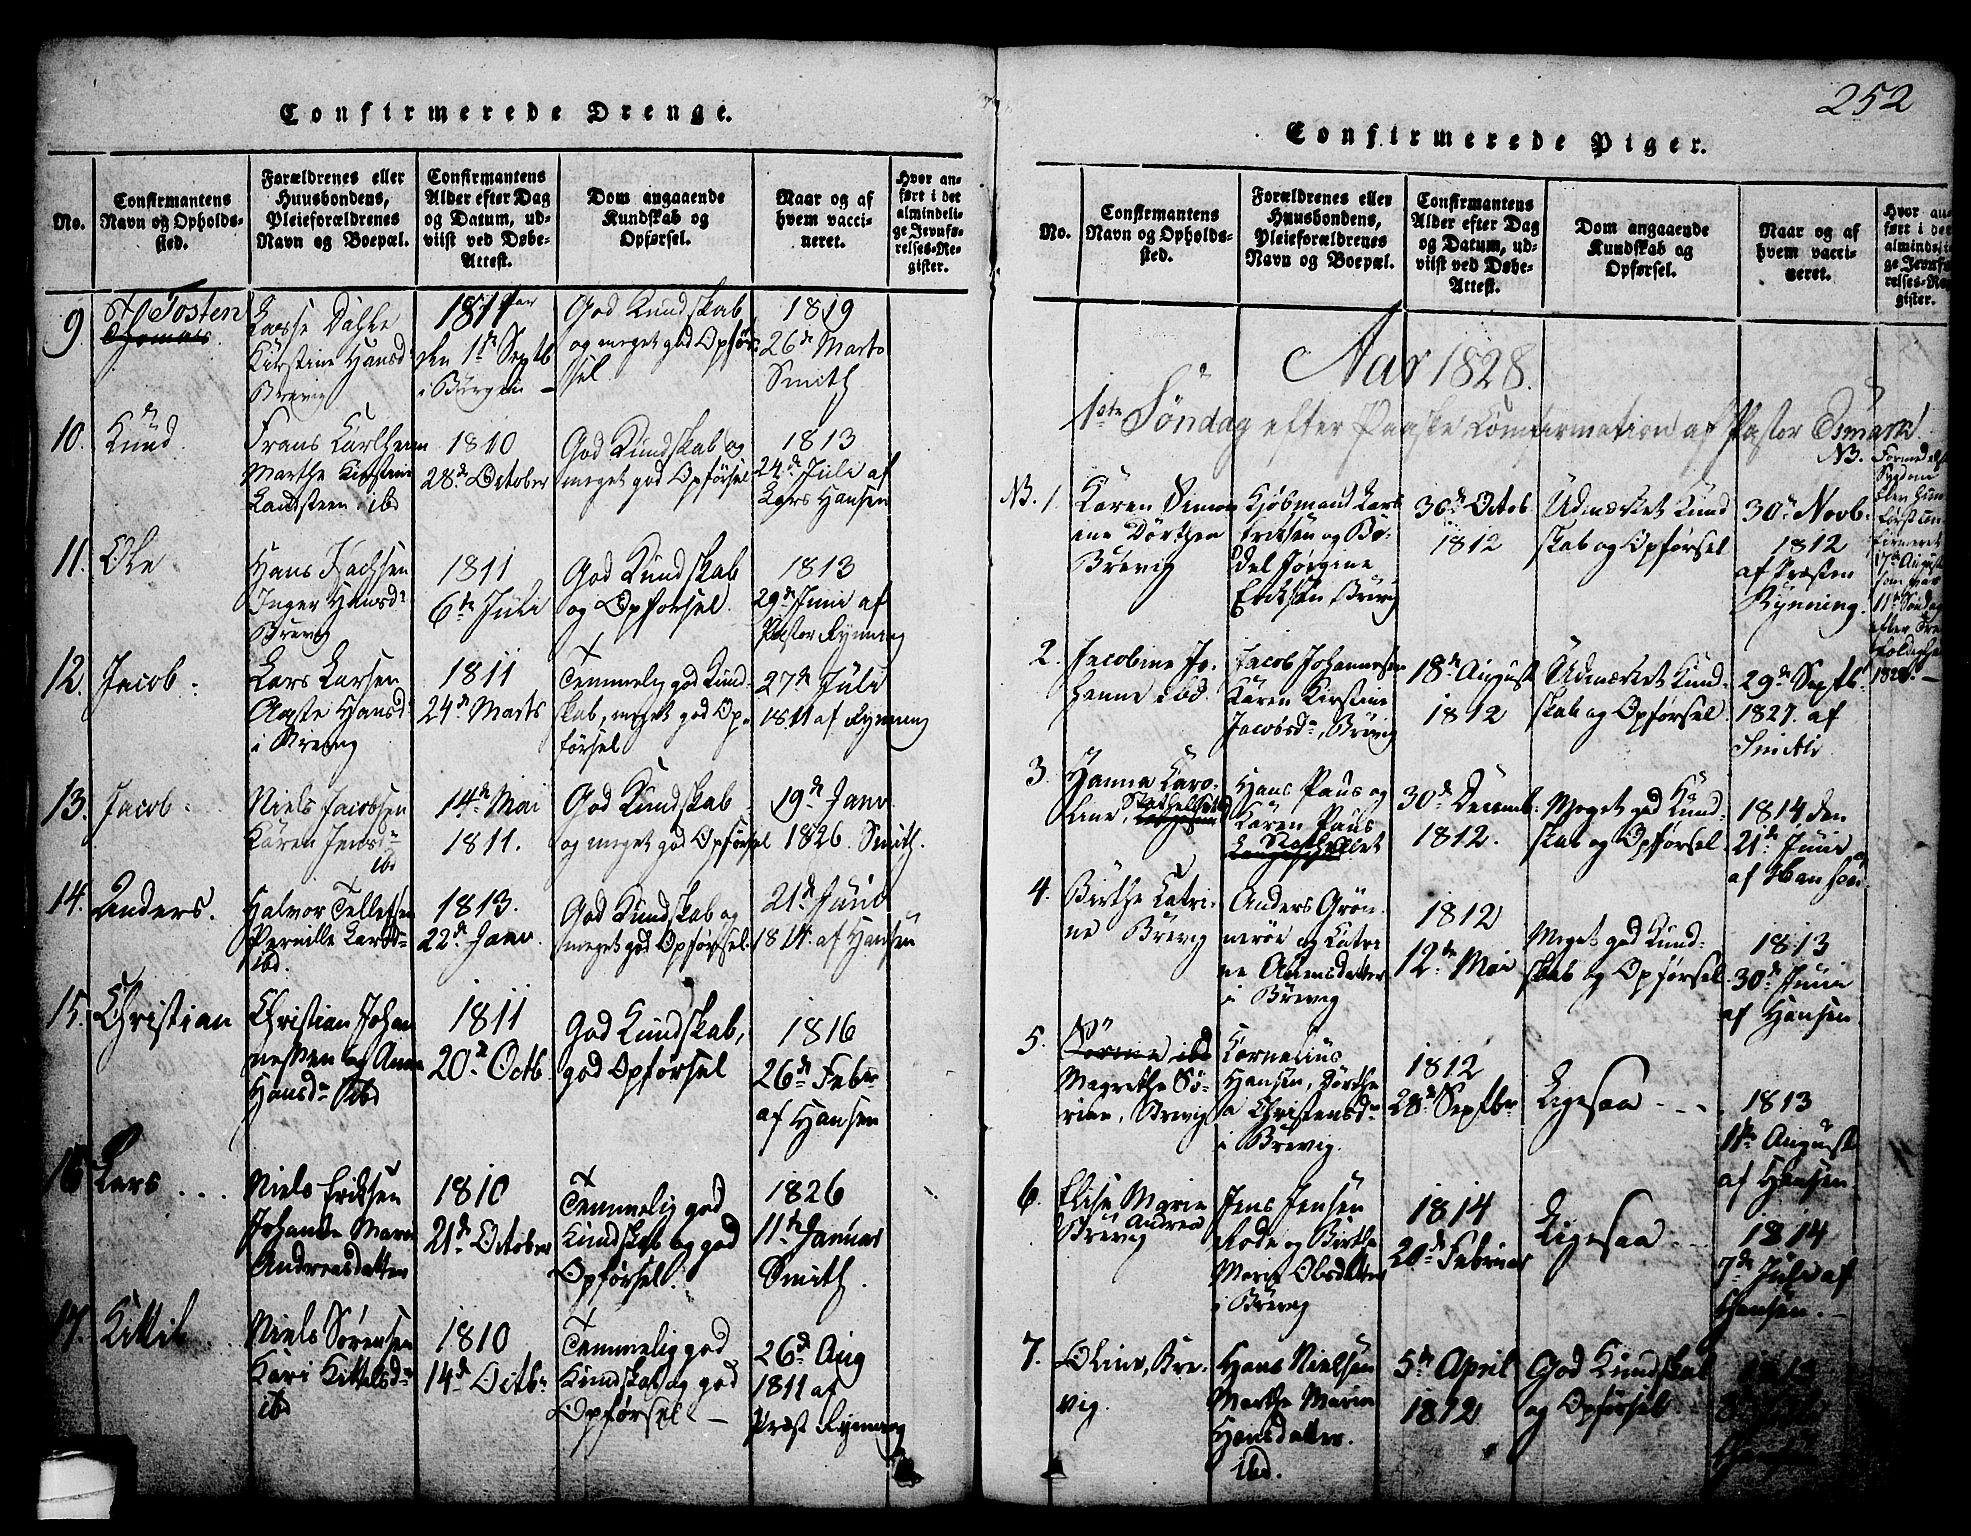 SAKO, Brevik kirkebøker, G/Ga/L0001: Klokkerbok nr. 1, 1814-1845, s. 252